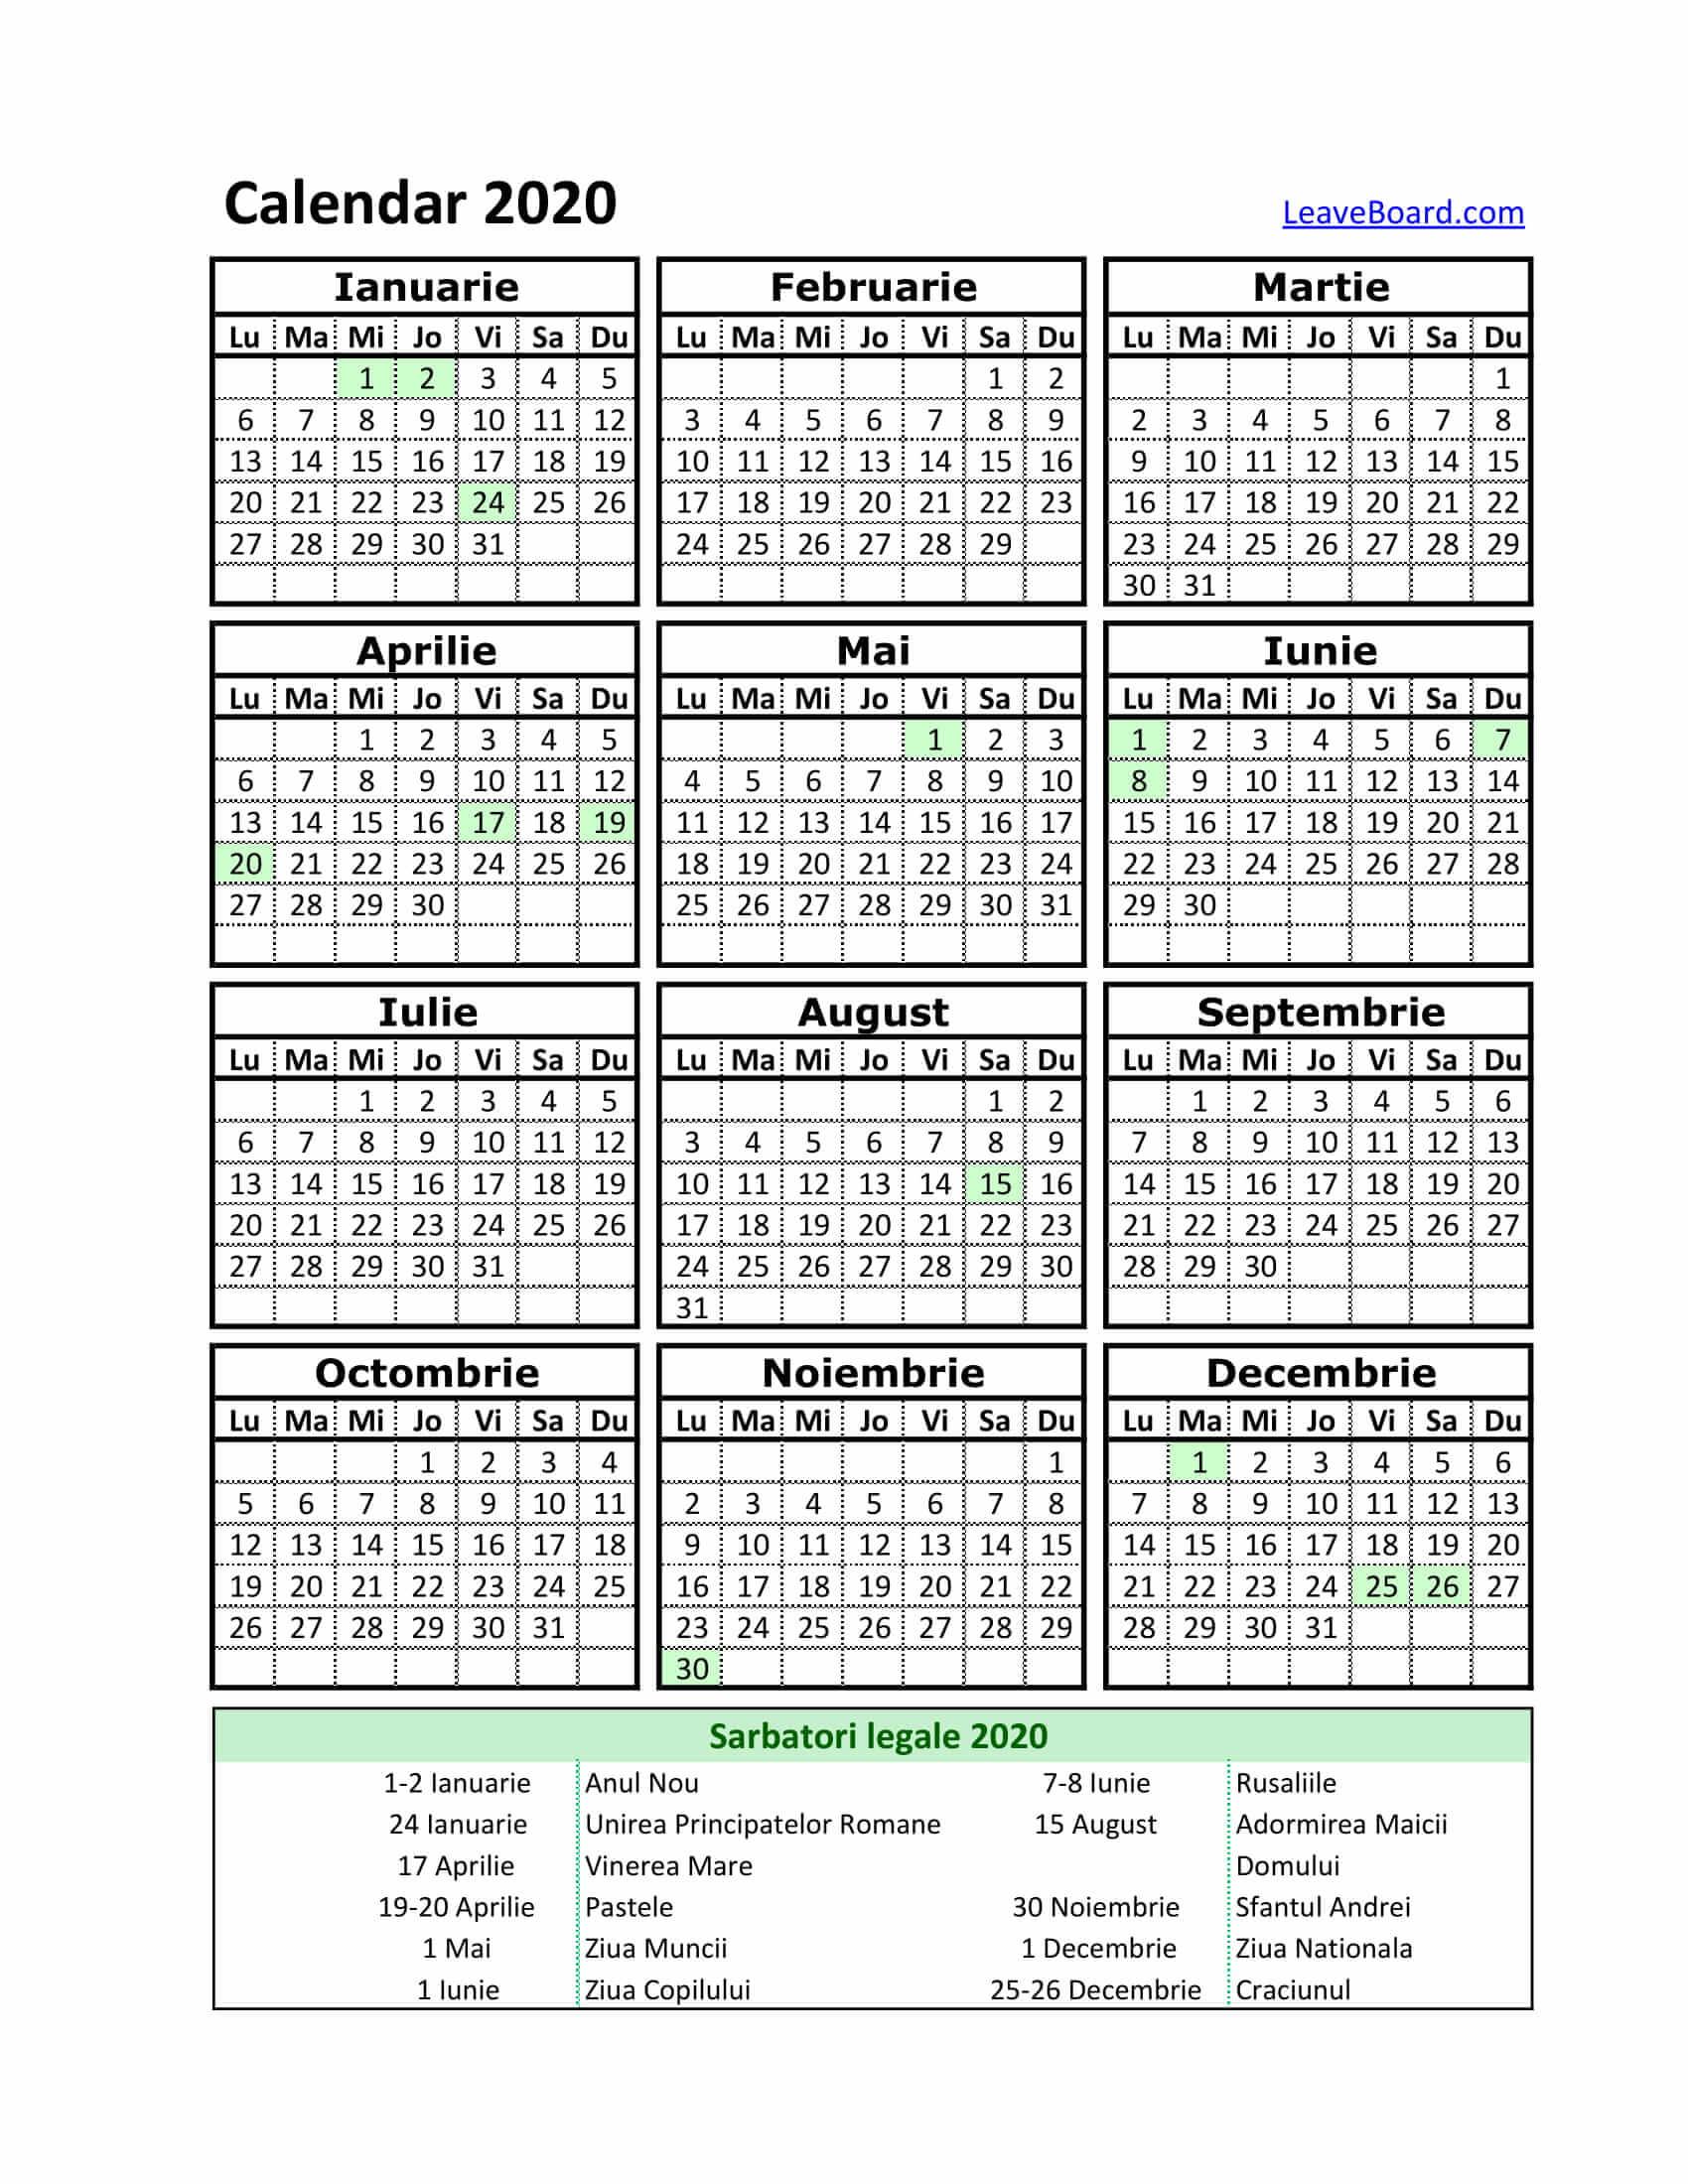 Calendar 2020 | Leaveboard regarding Calendar 2020 Zile Libere